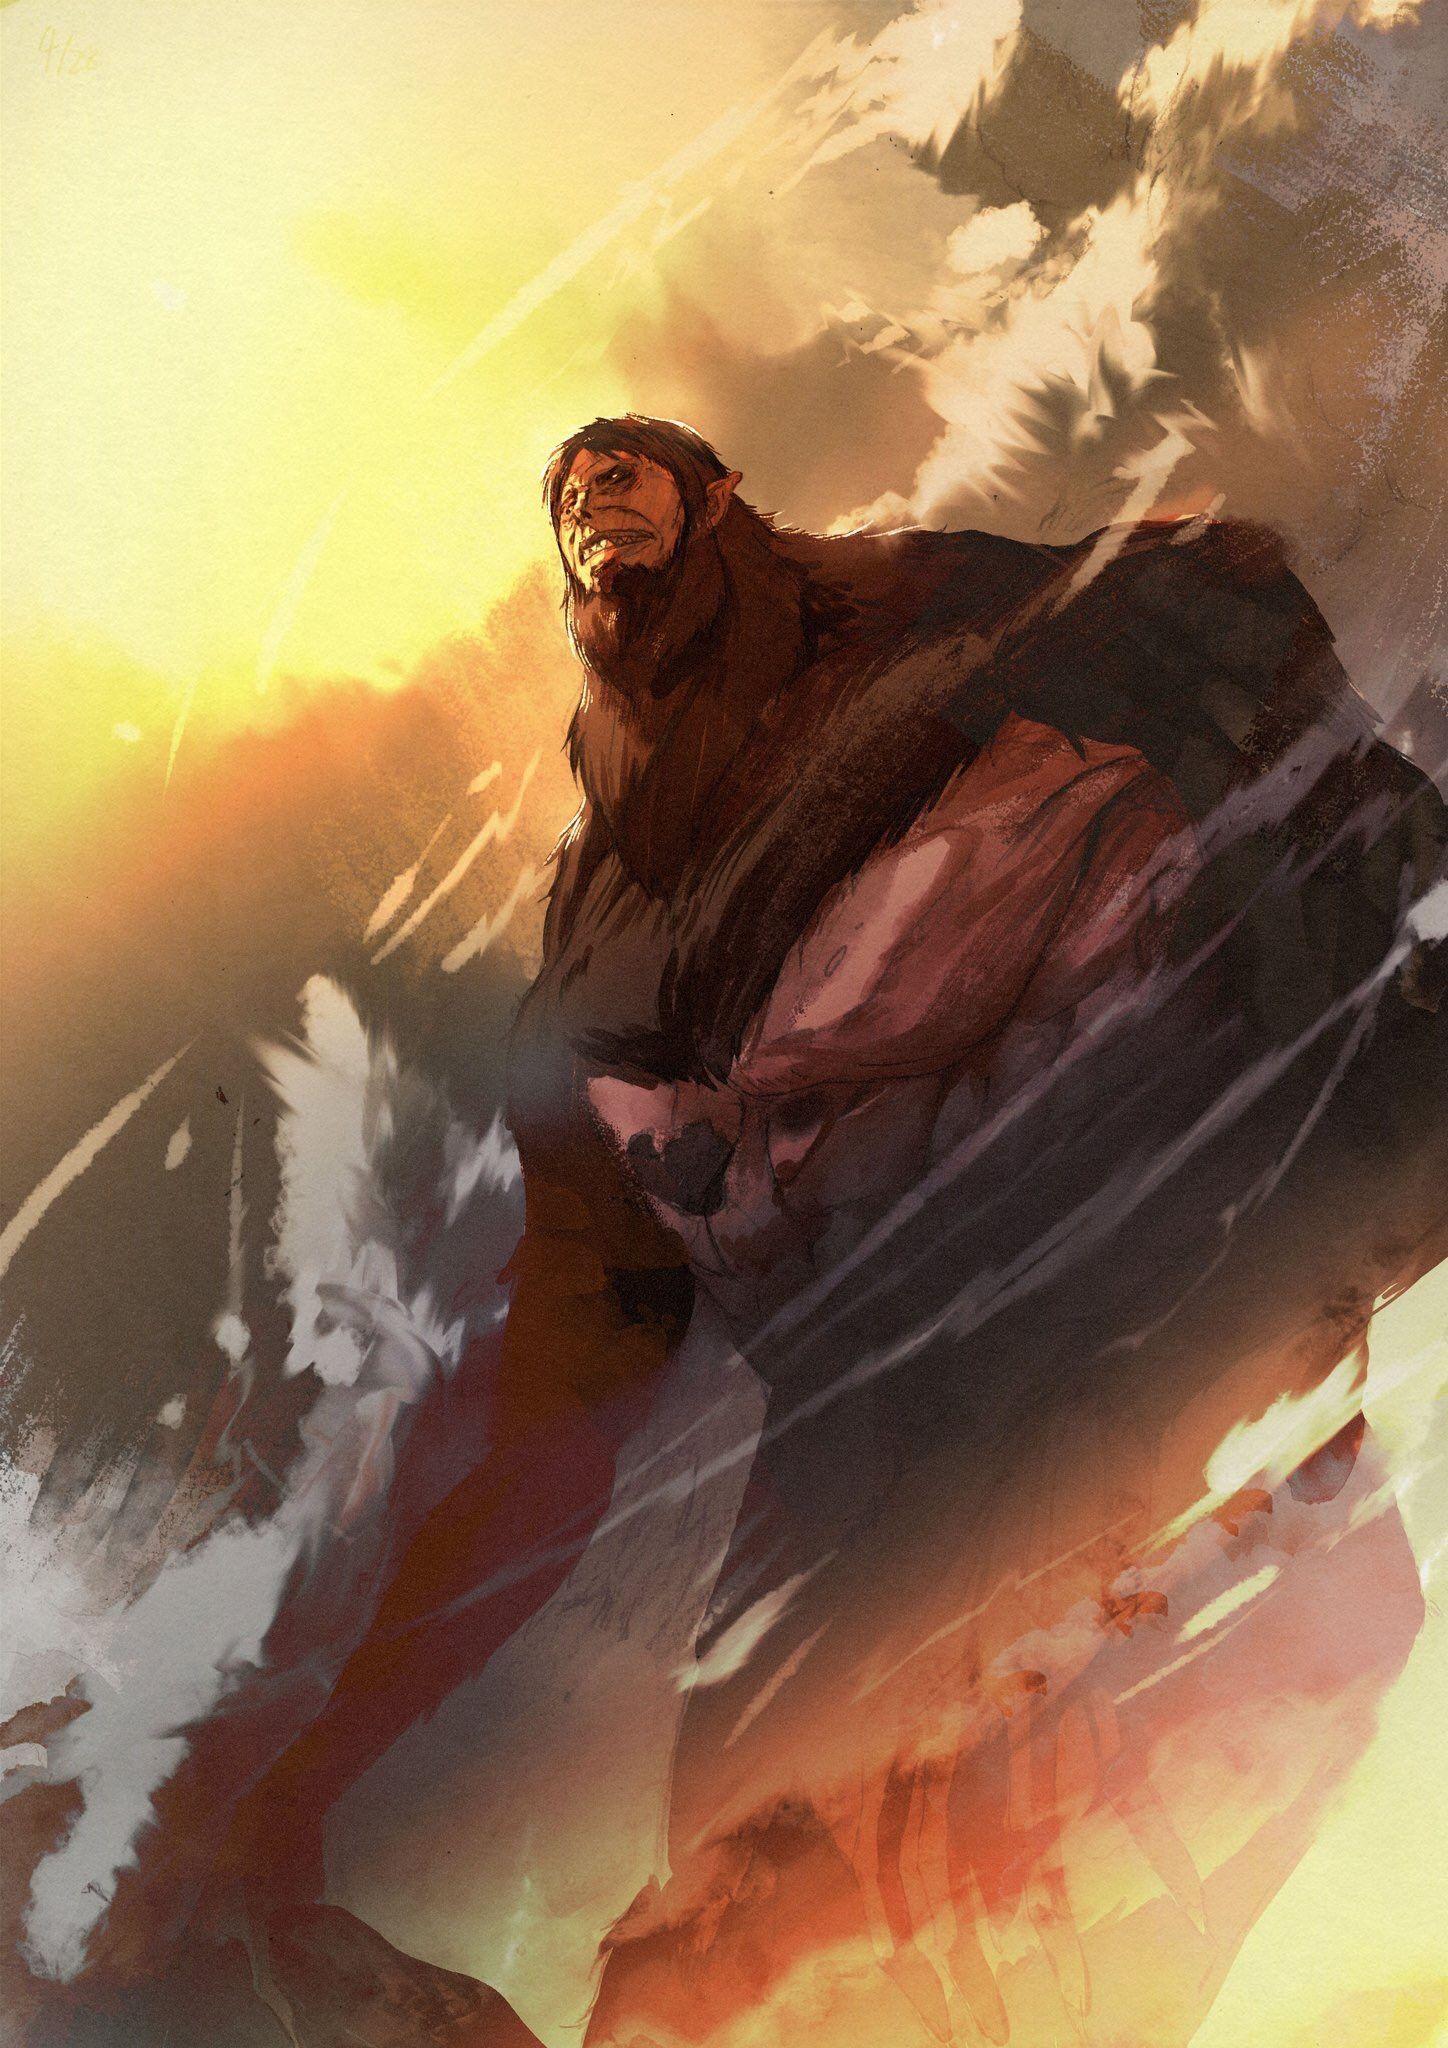 Zeke Beast Titan Attack On Titan Attack On Titan Anime Attack On Titan Art Attack On Titan